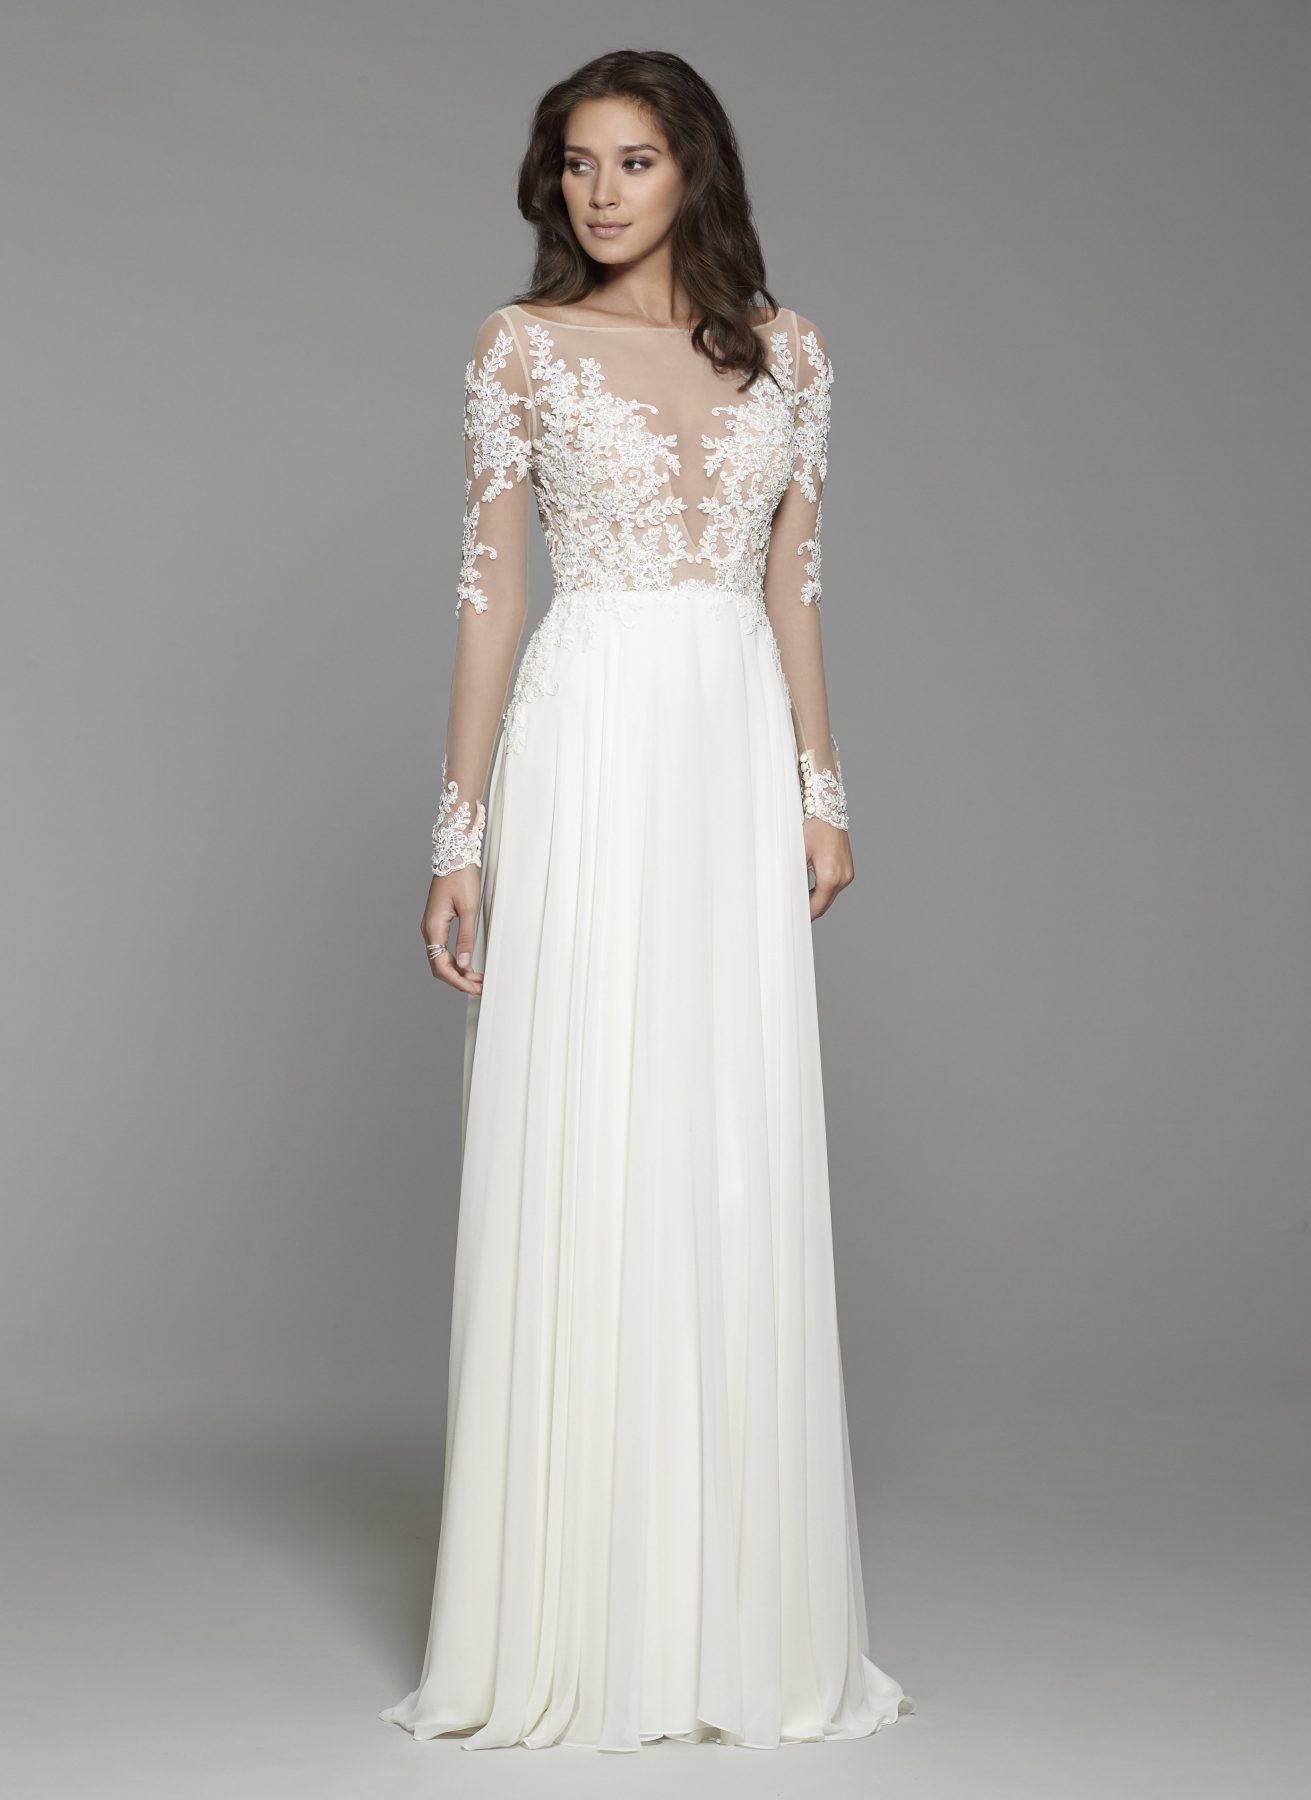 33710302 Romantic A-line Wedding Dress | Kleinfeld Bridal